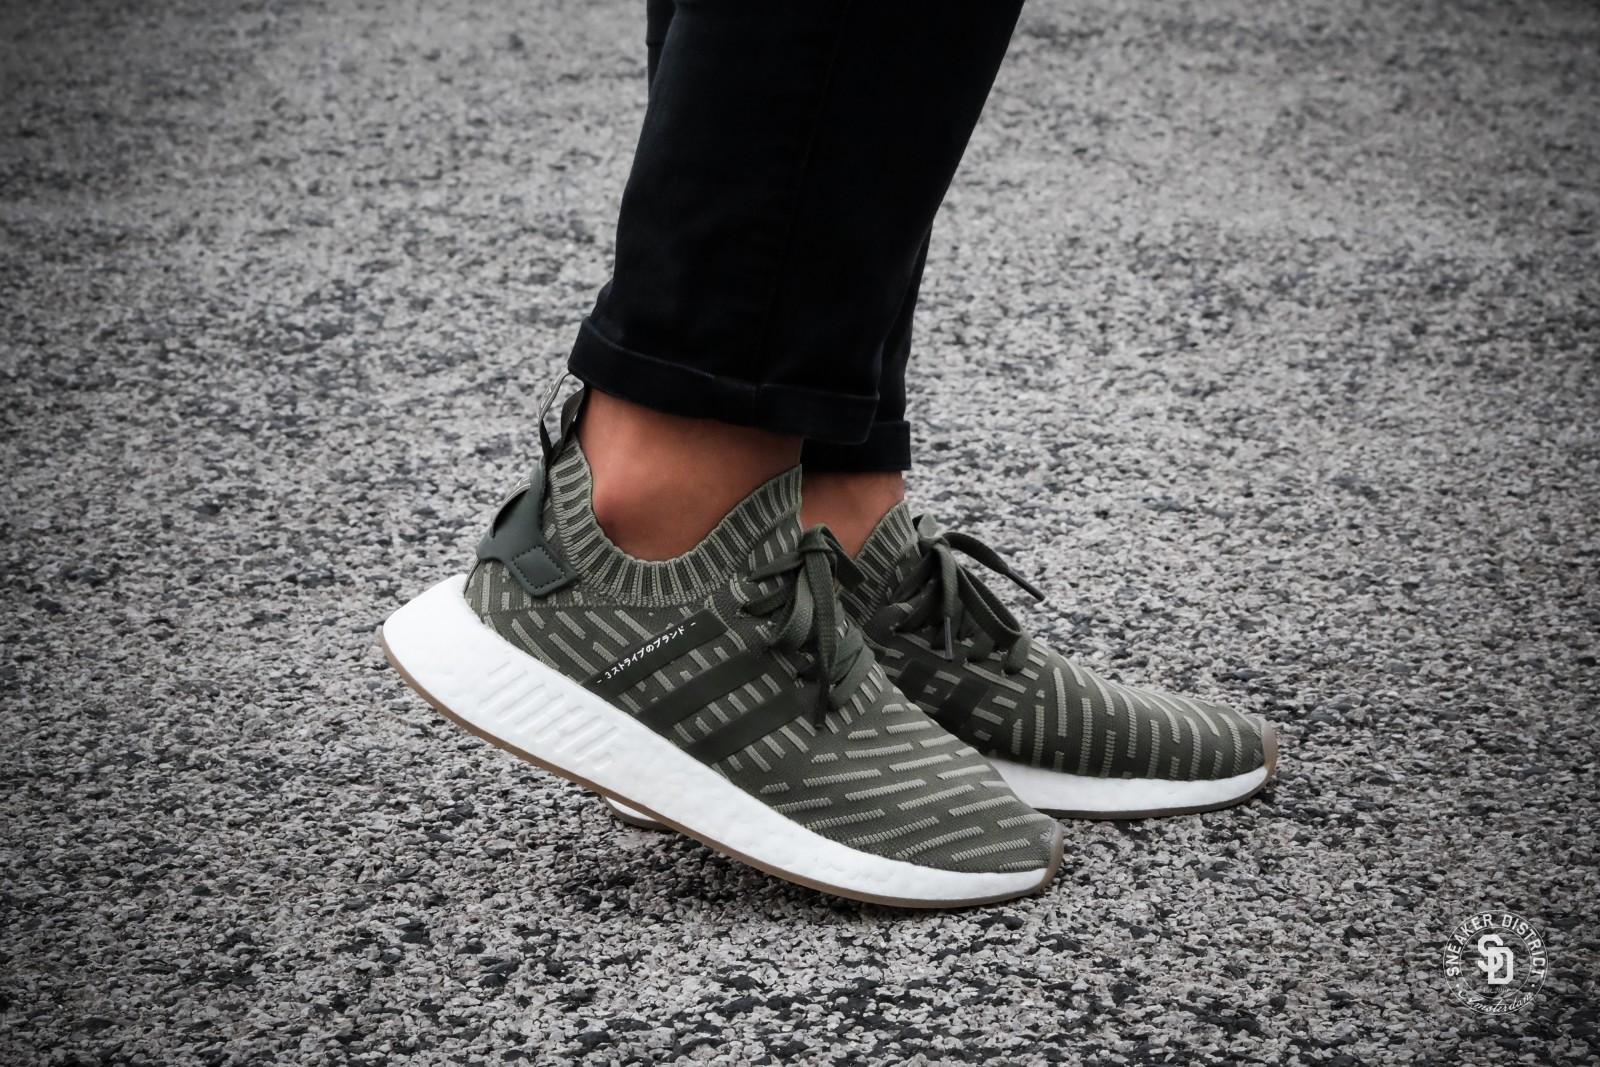 Adidas Women's NMD R2 Primeknit Green